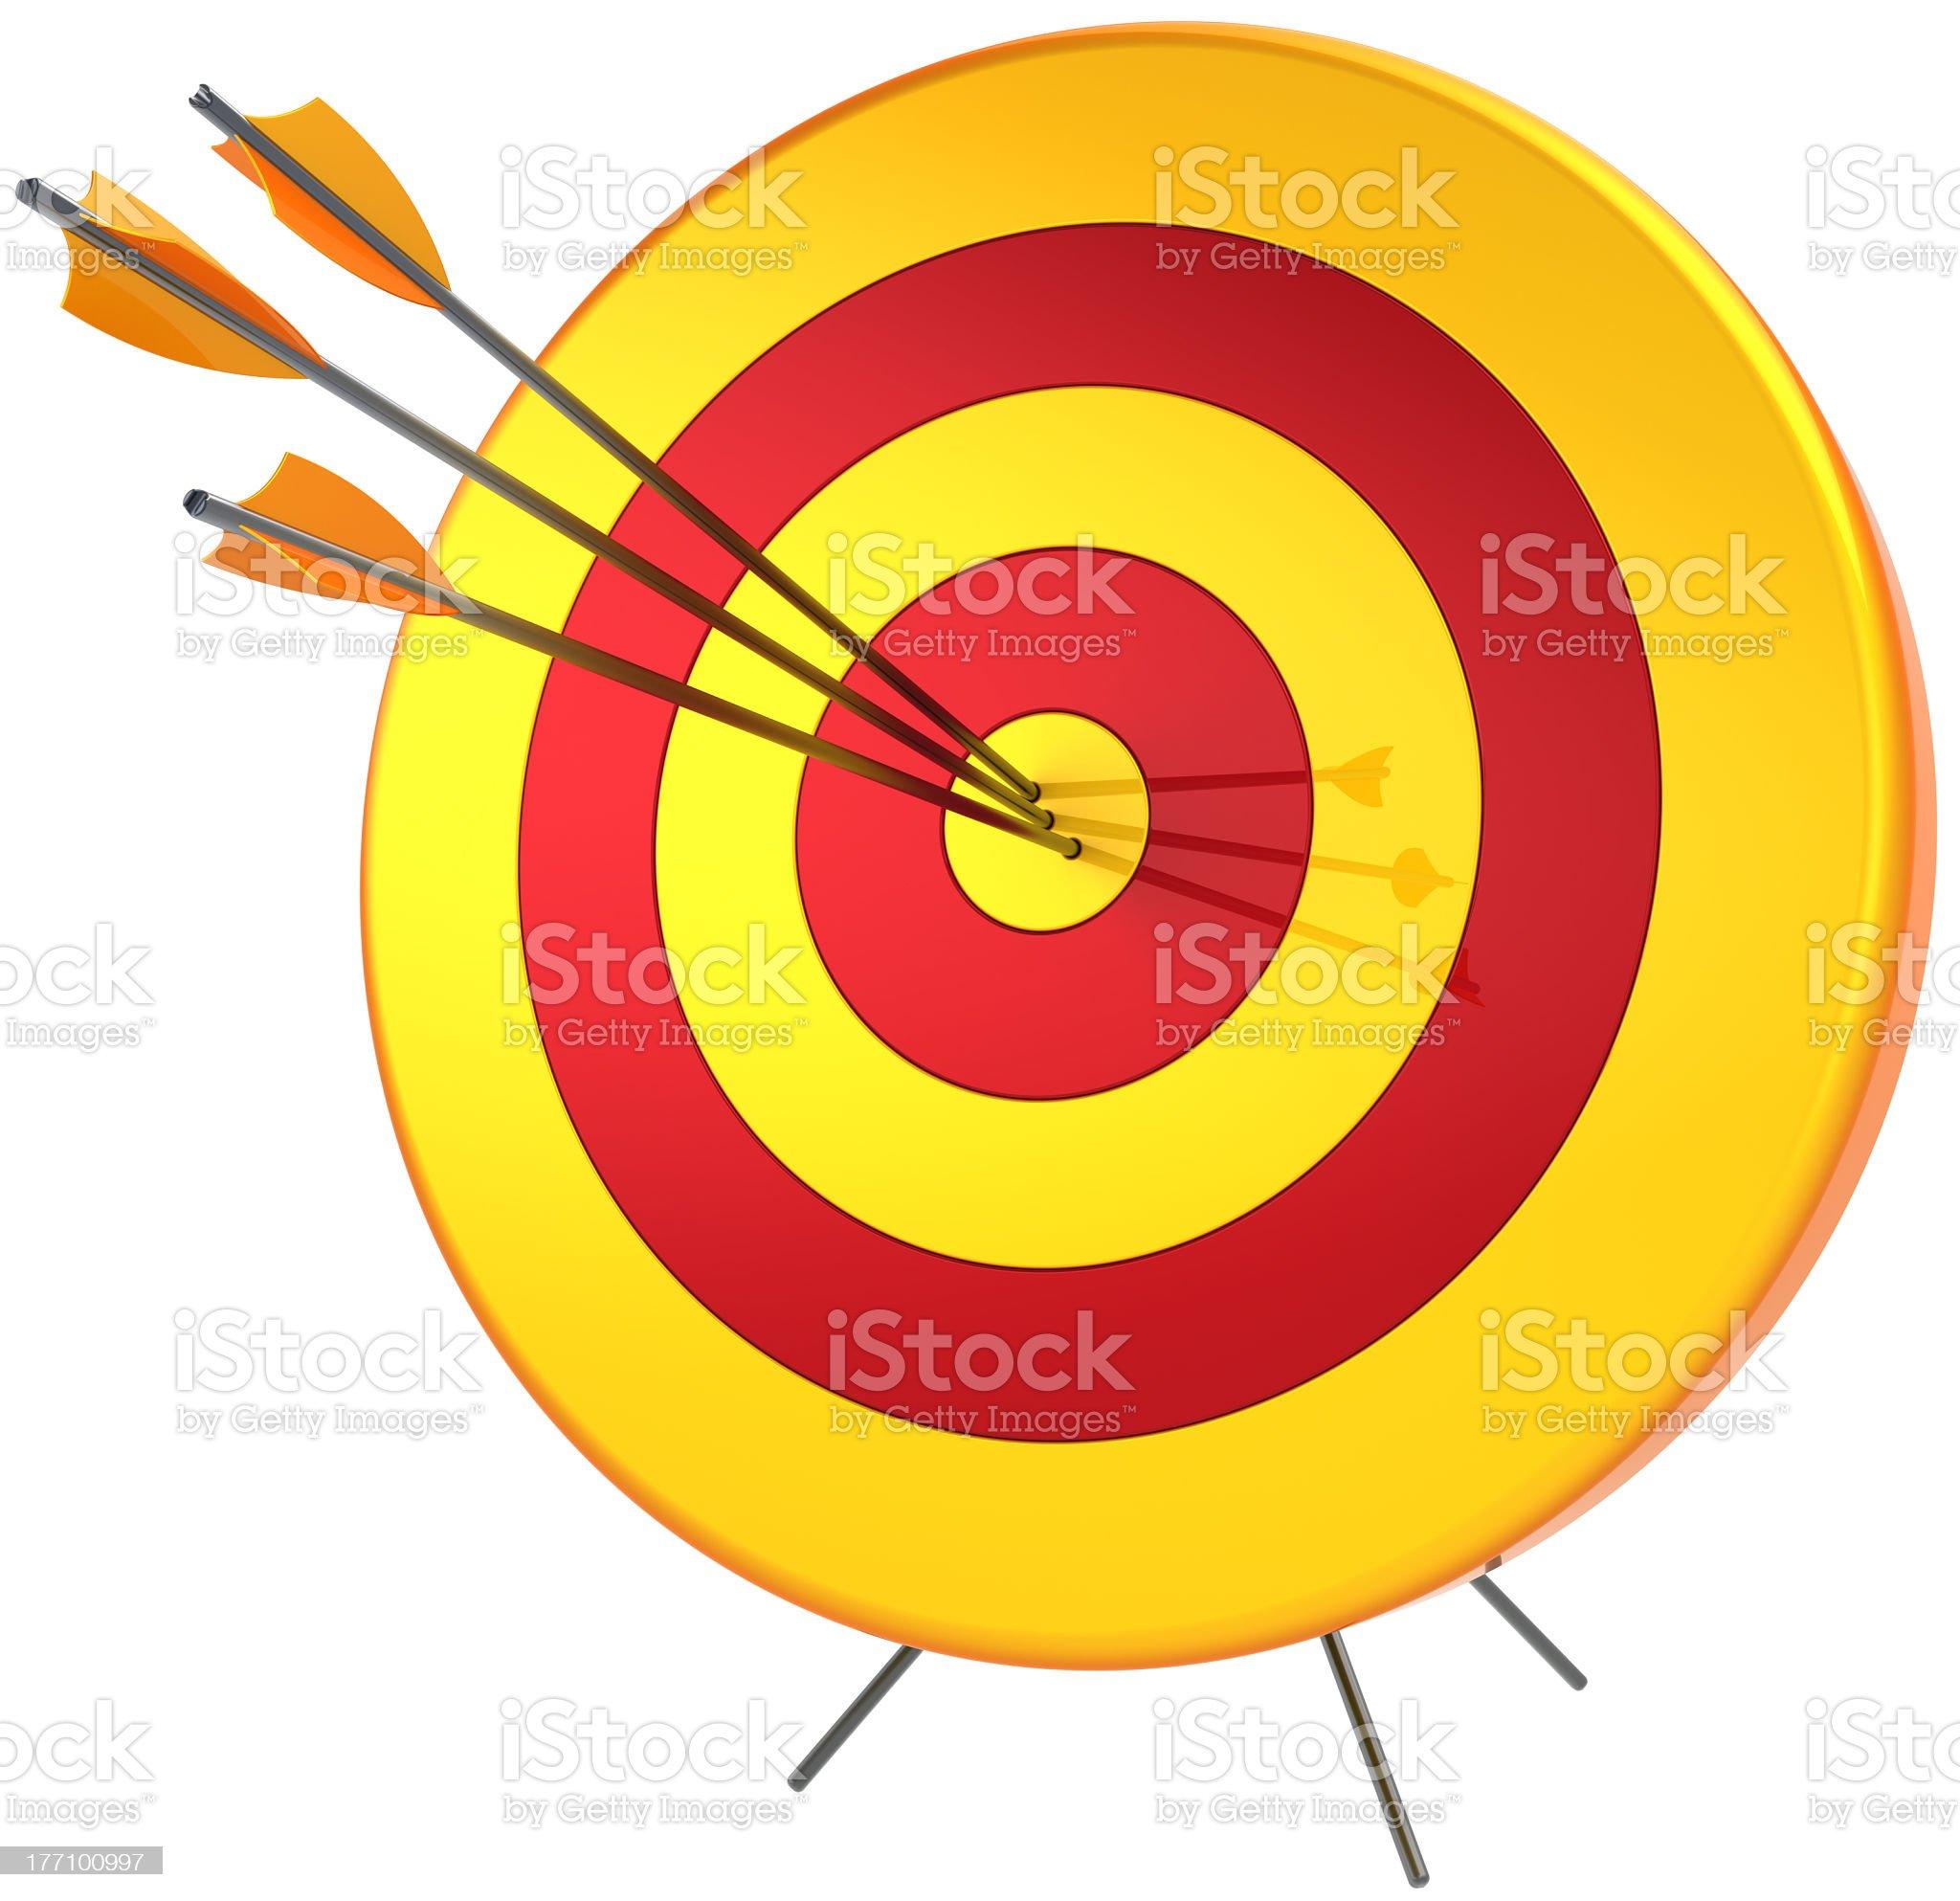 Succesful target bulls eye shooting royalty-free stock photo